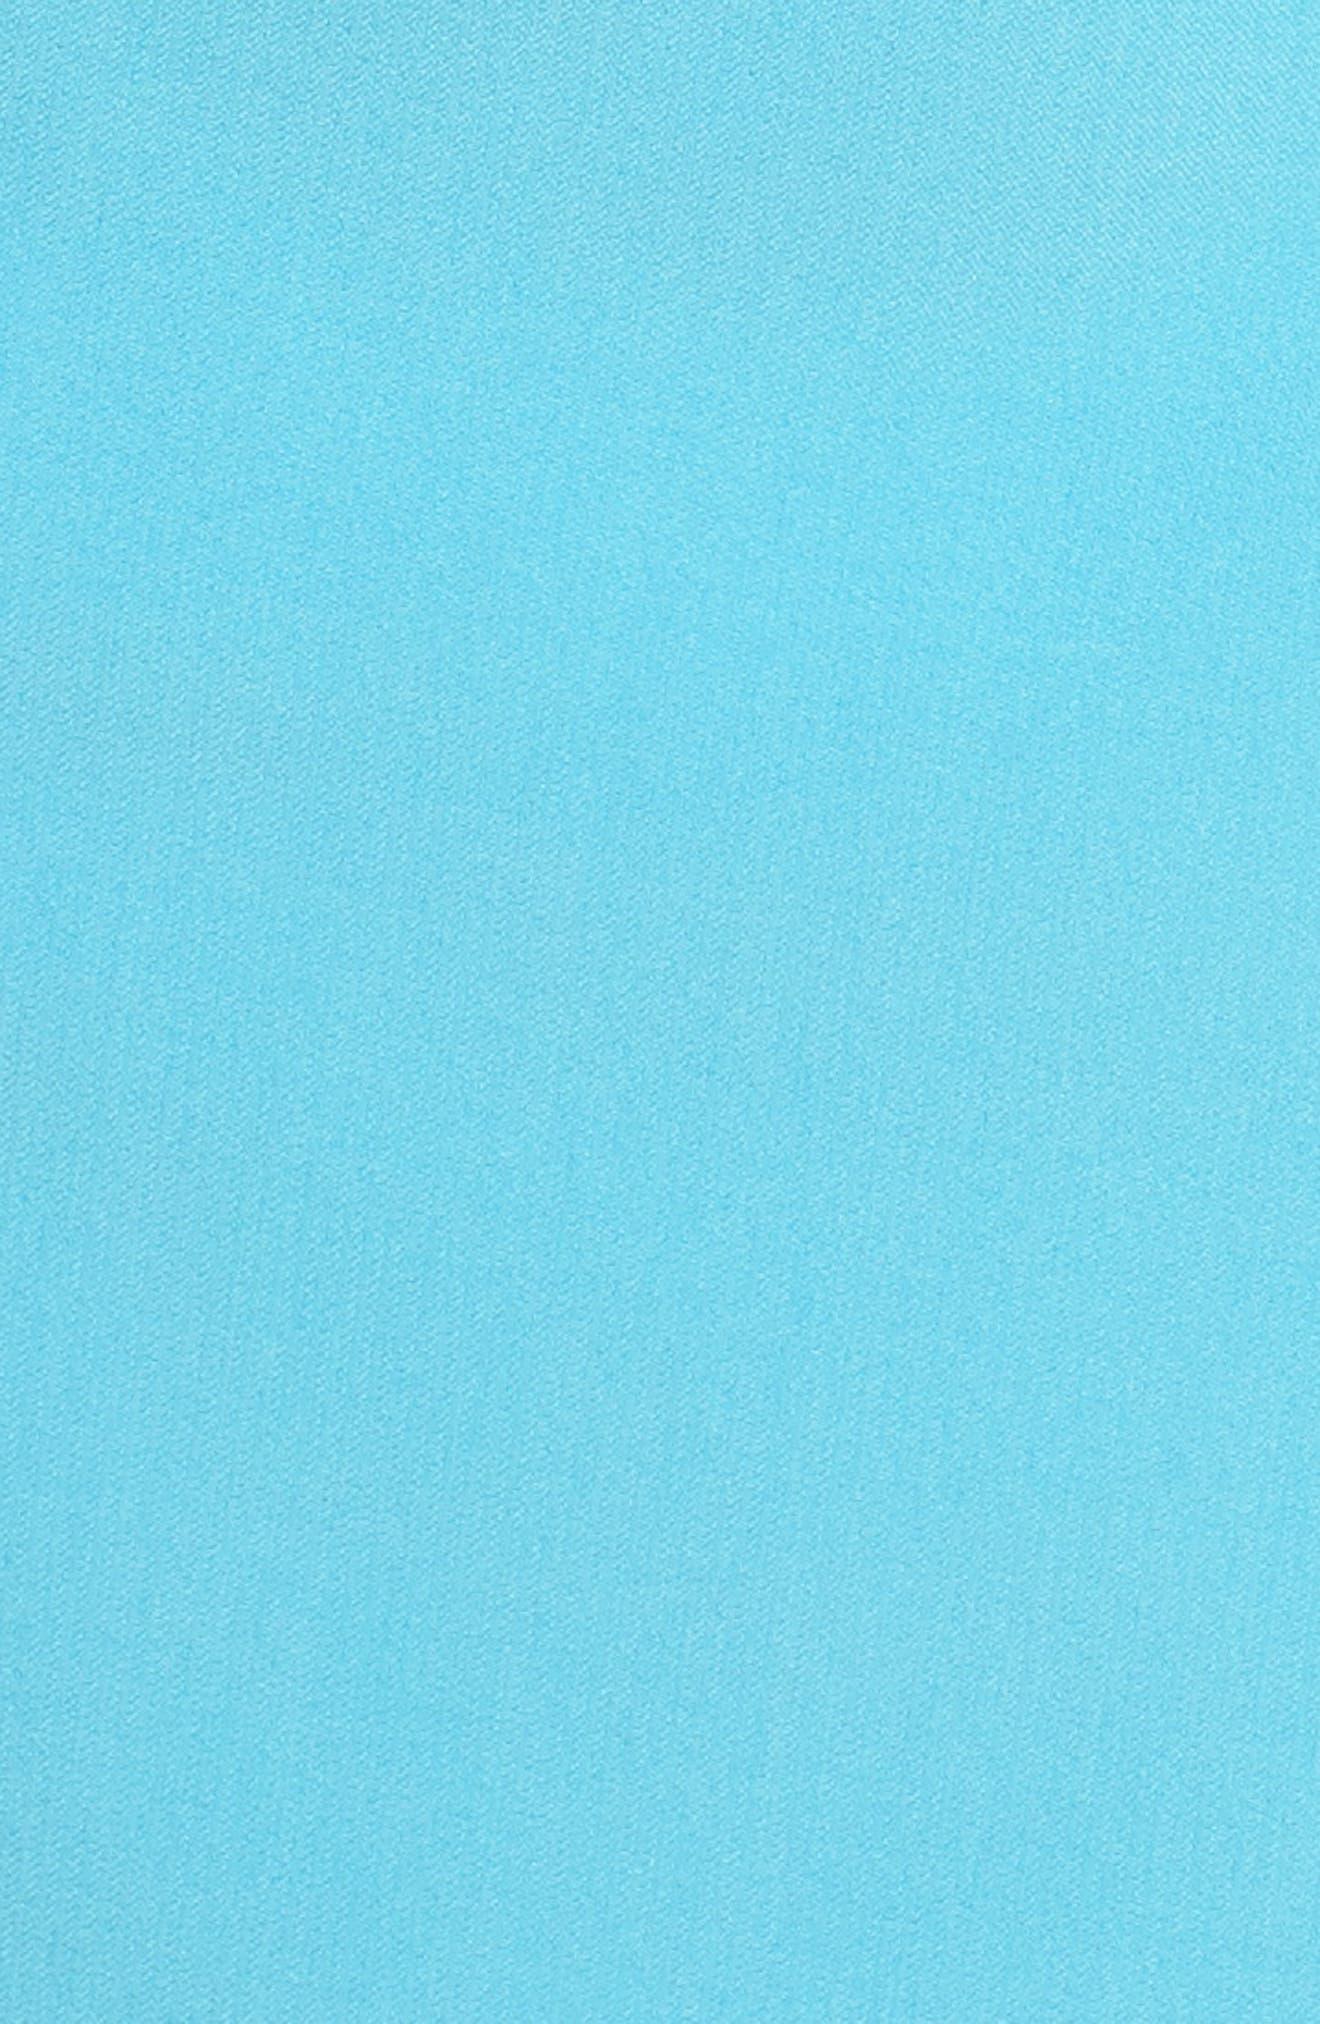 Stretch Sheath Dress,                             Alternate thumbnail 5, color,                             Pacific Blue